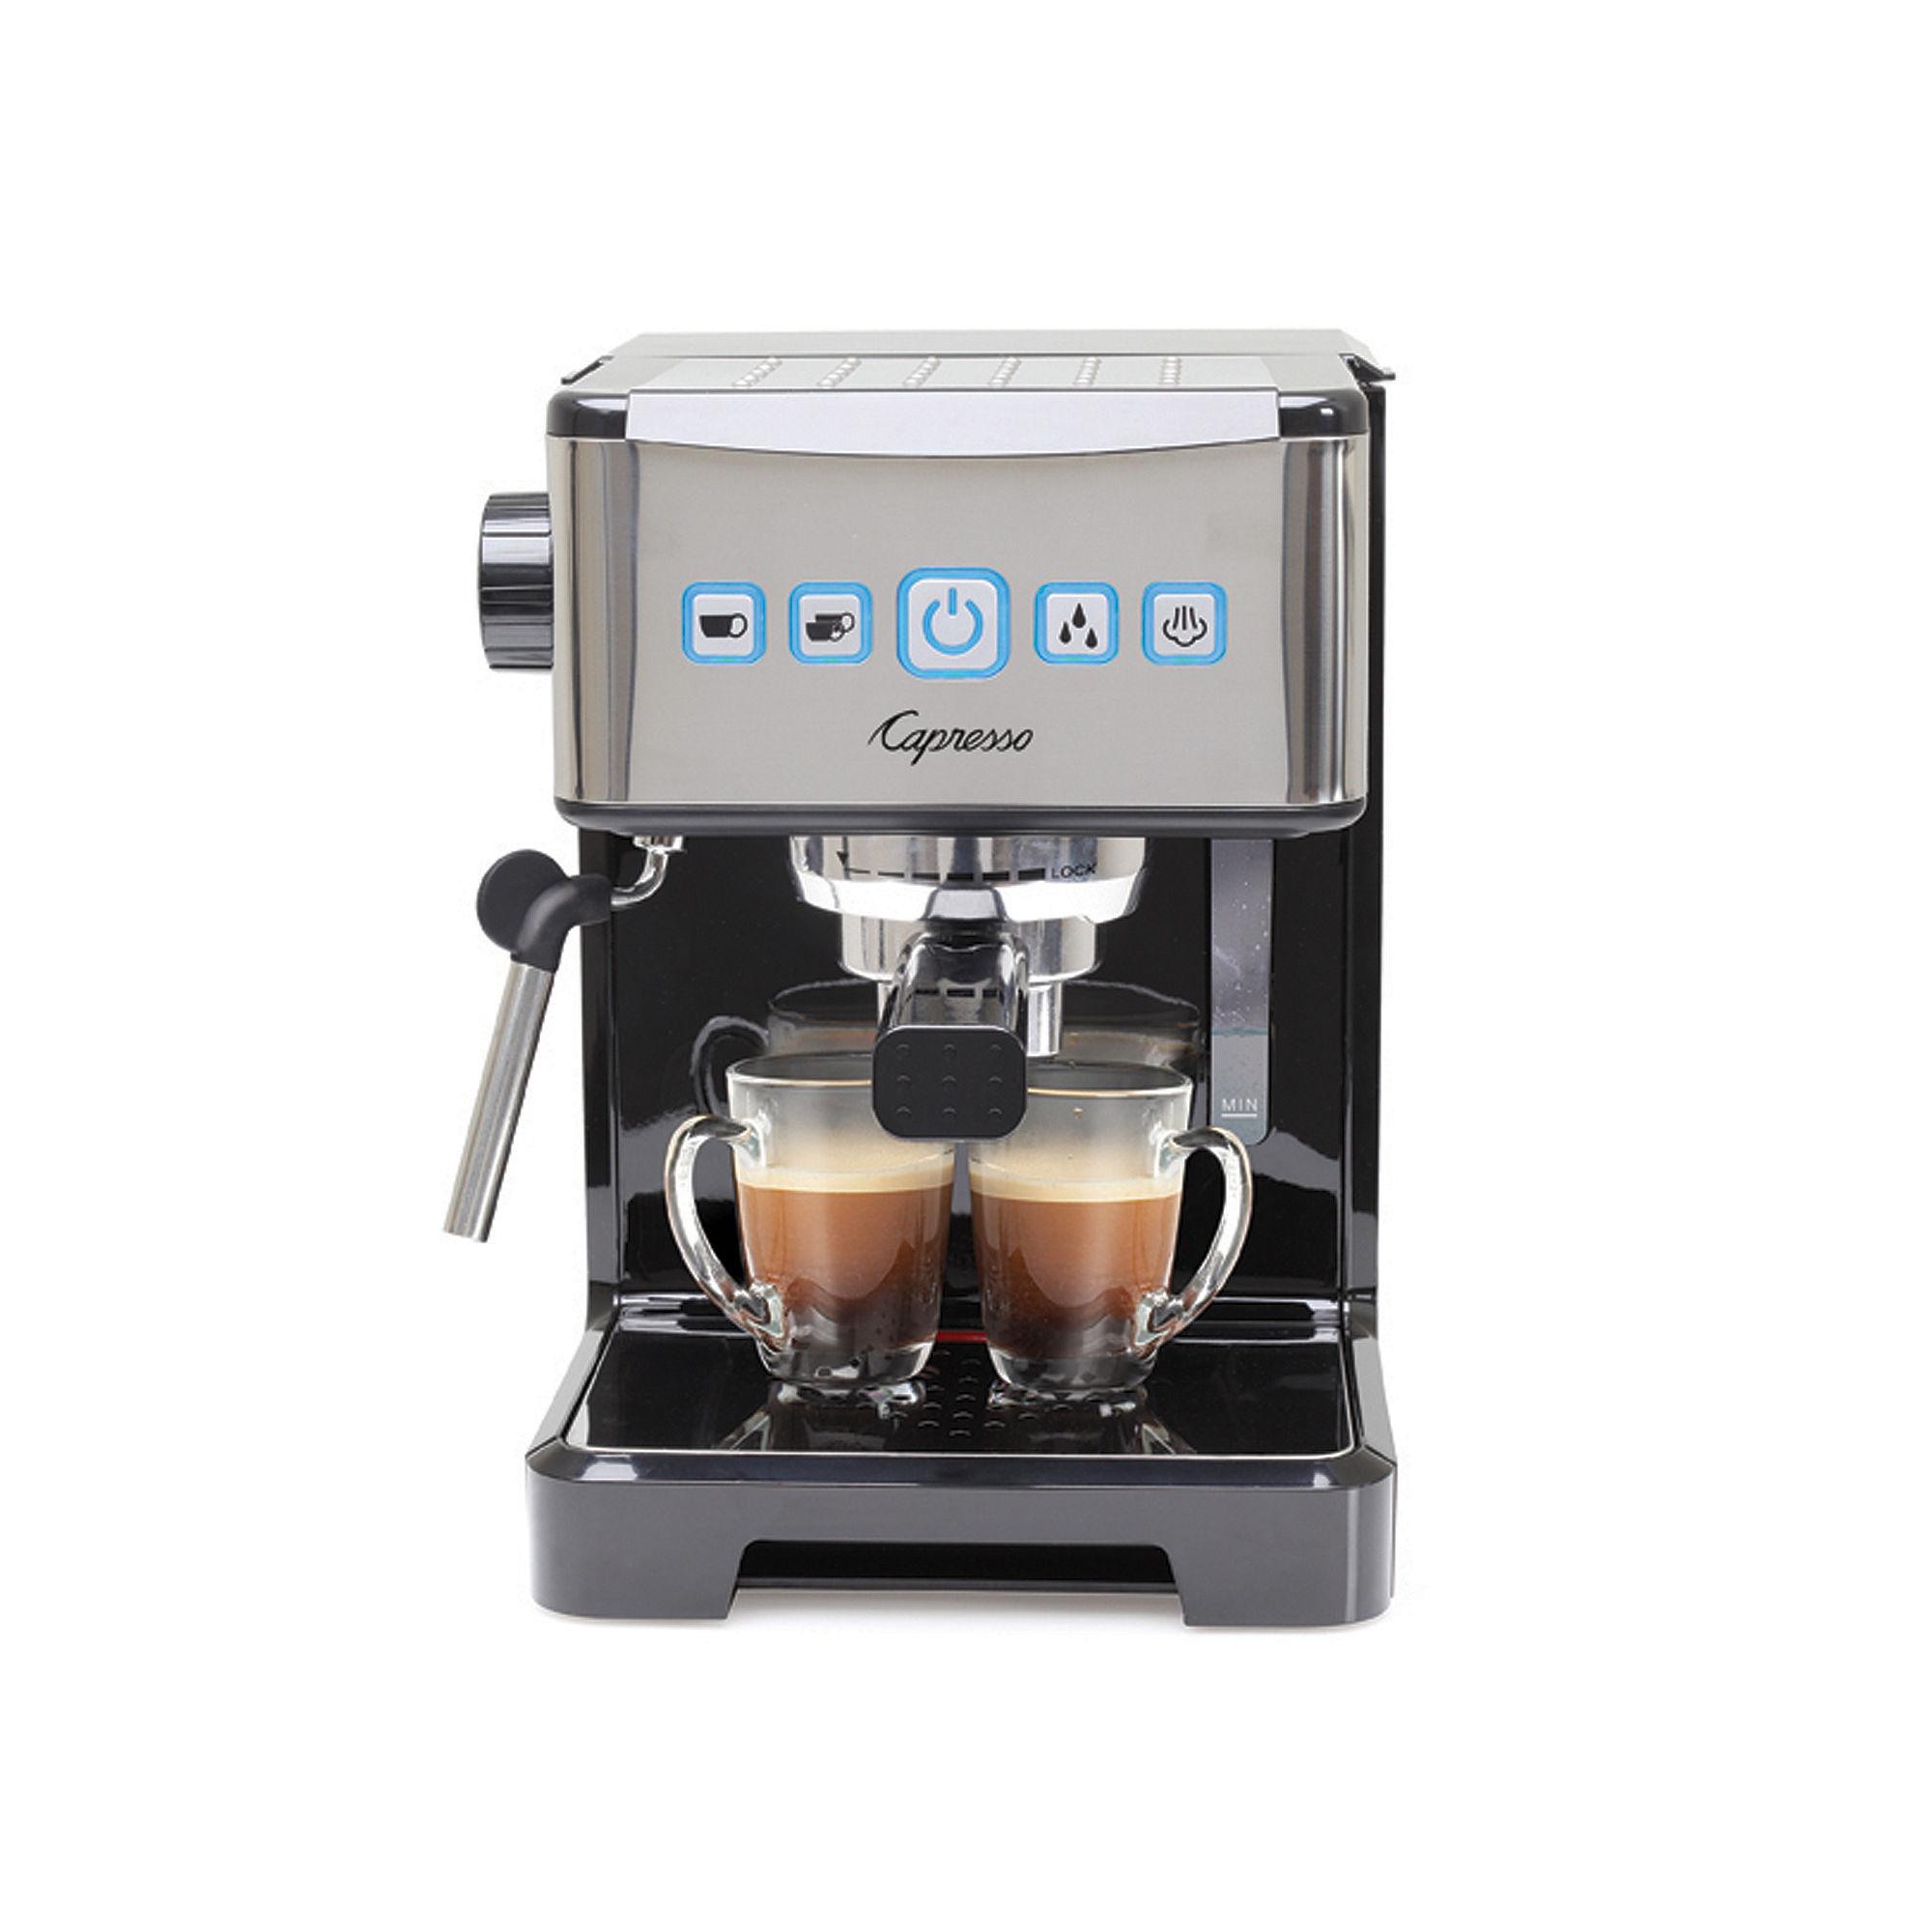 capresso espresso machine repair 100 jura capresso coffee grinder jura j95 carbon one touch. Black Bedroom Furniture Sets. Home Design Ideas